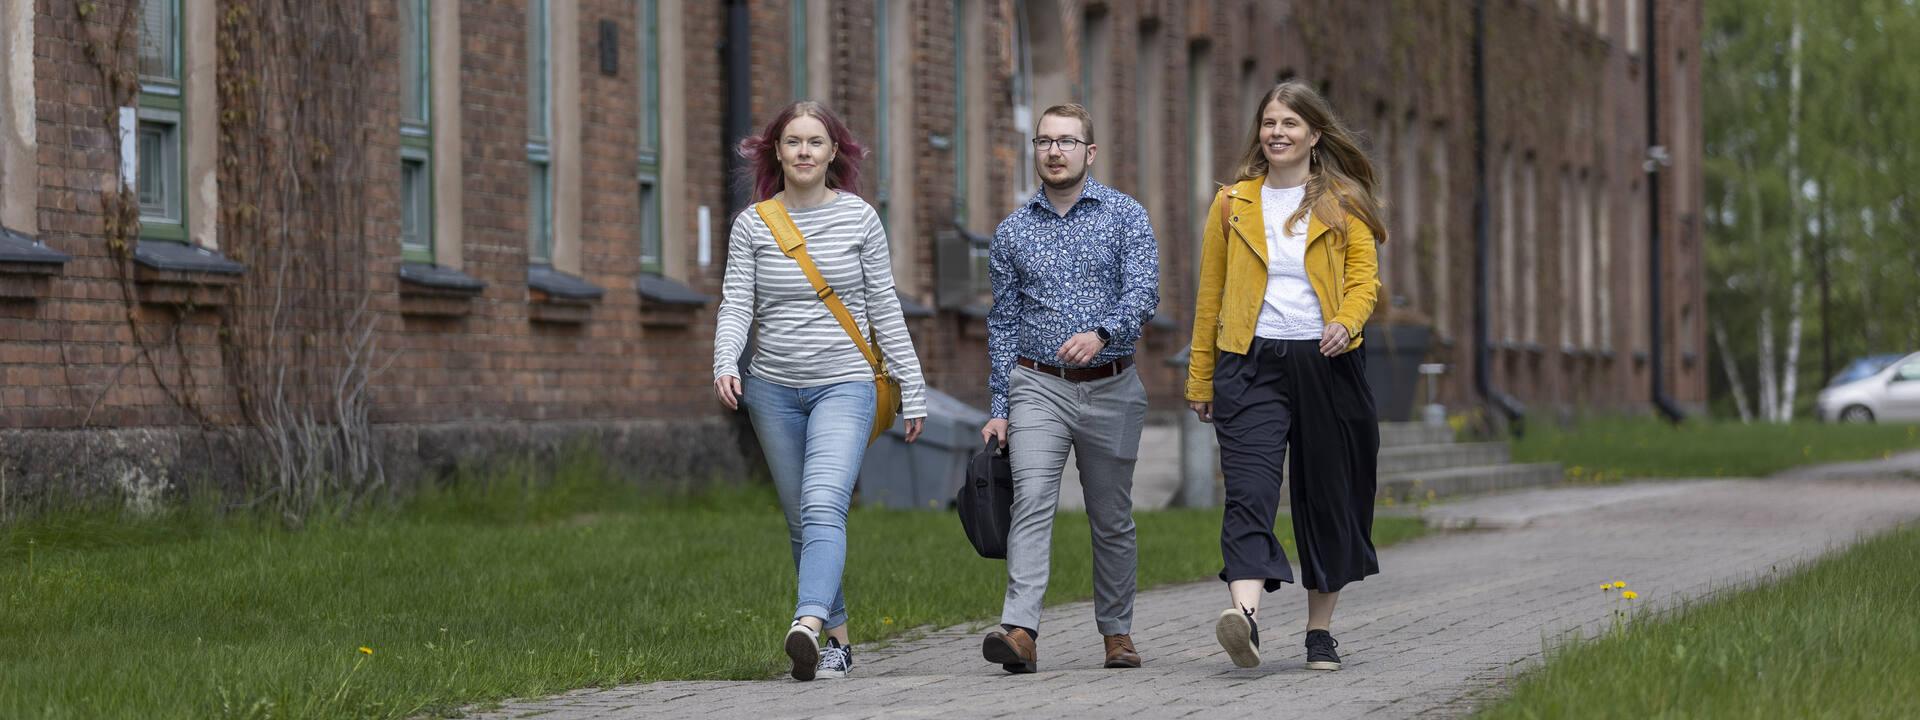 Three women walking in Kouvola campus.